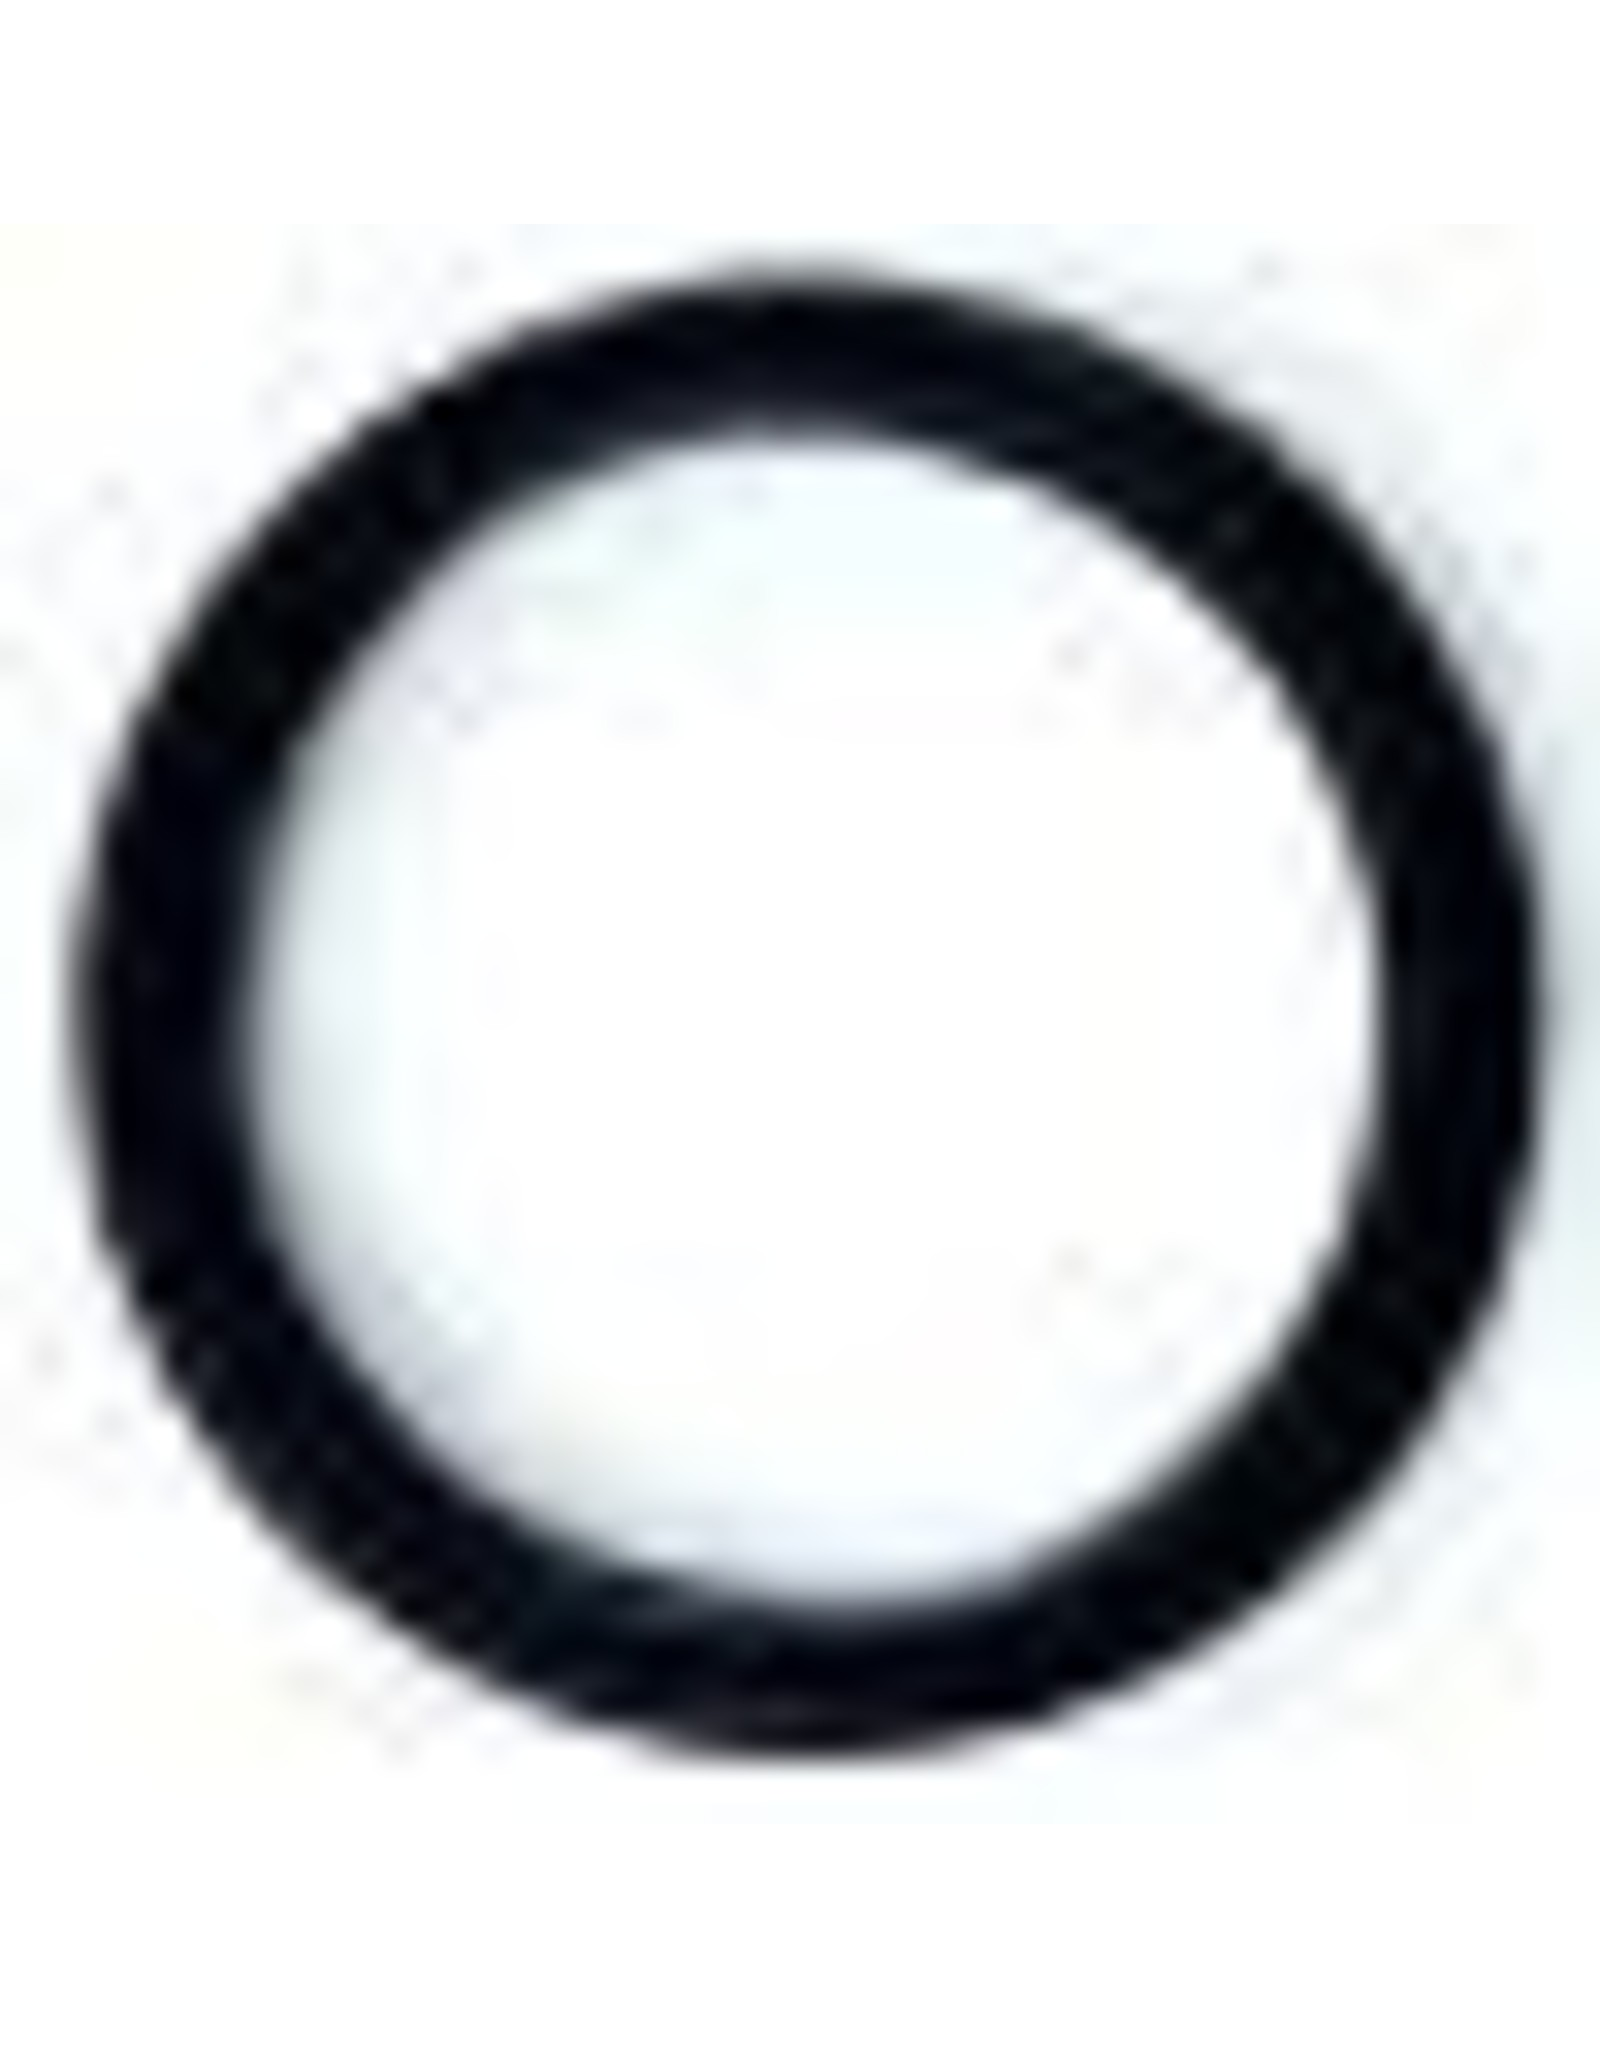 Perlick 425, 525, 575 O-ring